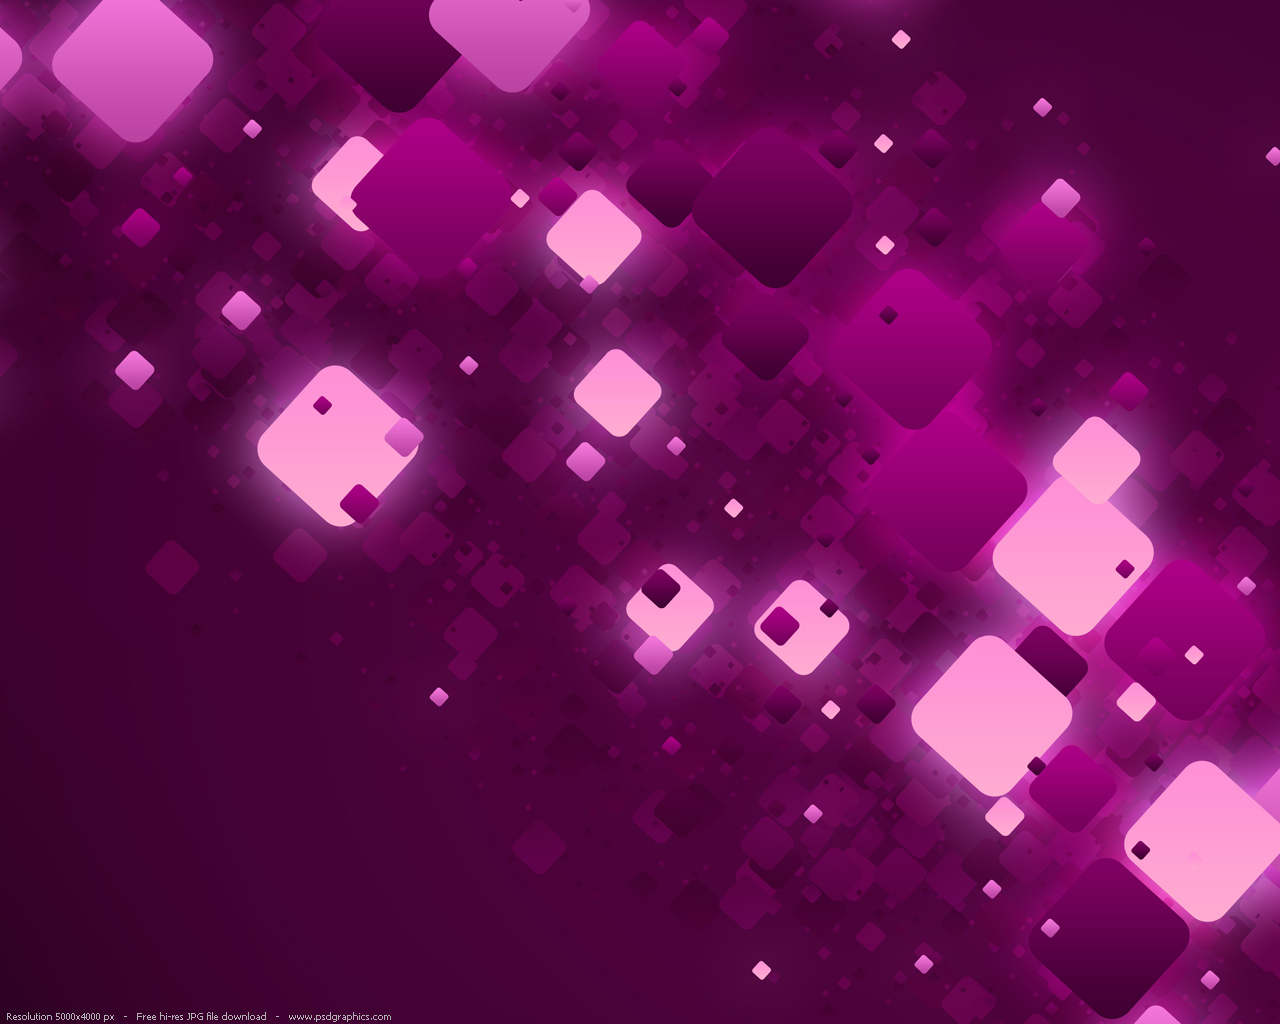 Purple Abstract Wallpaper 1280x1024 3546